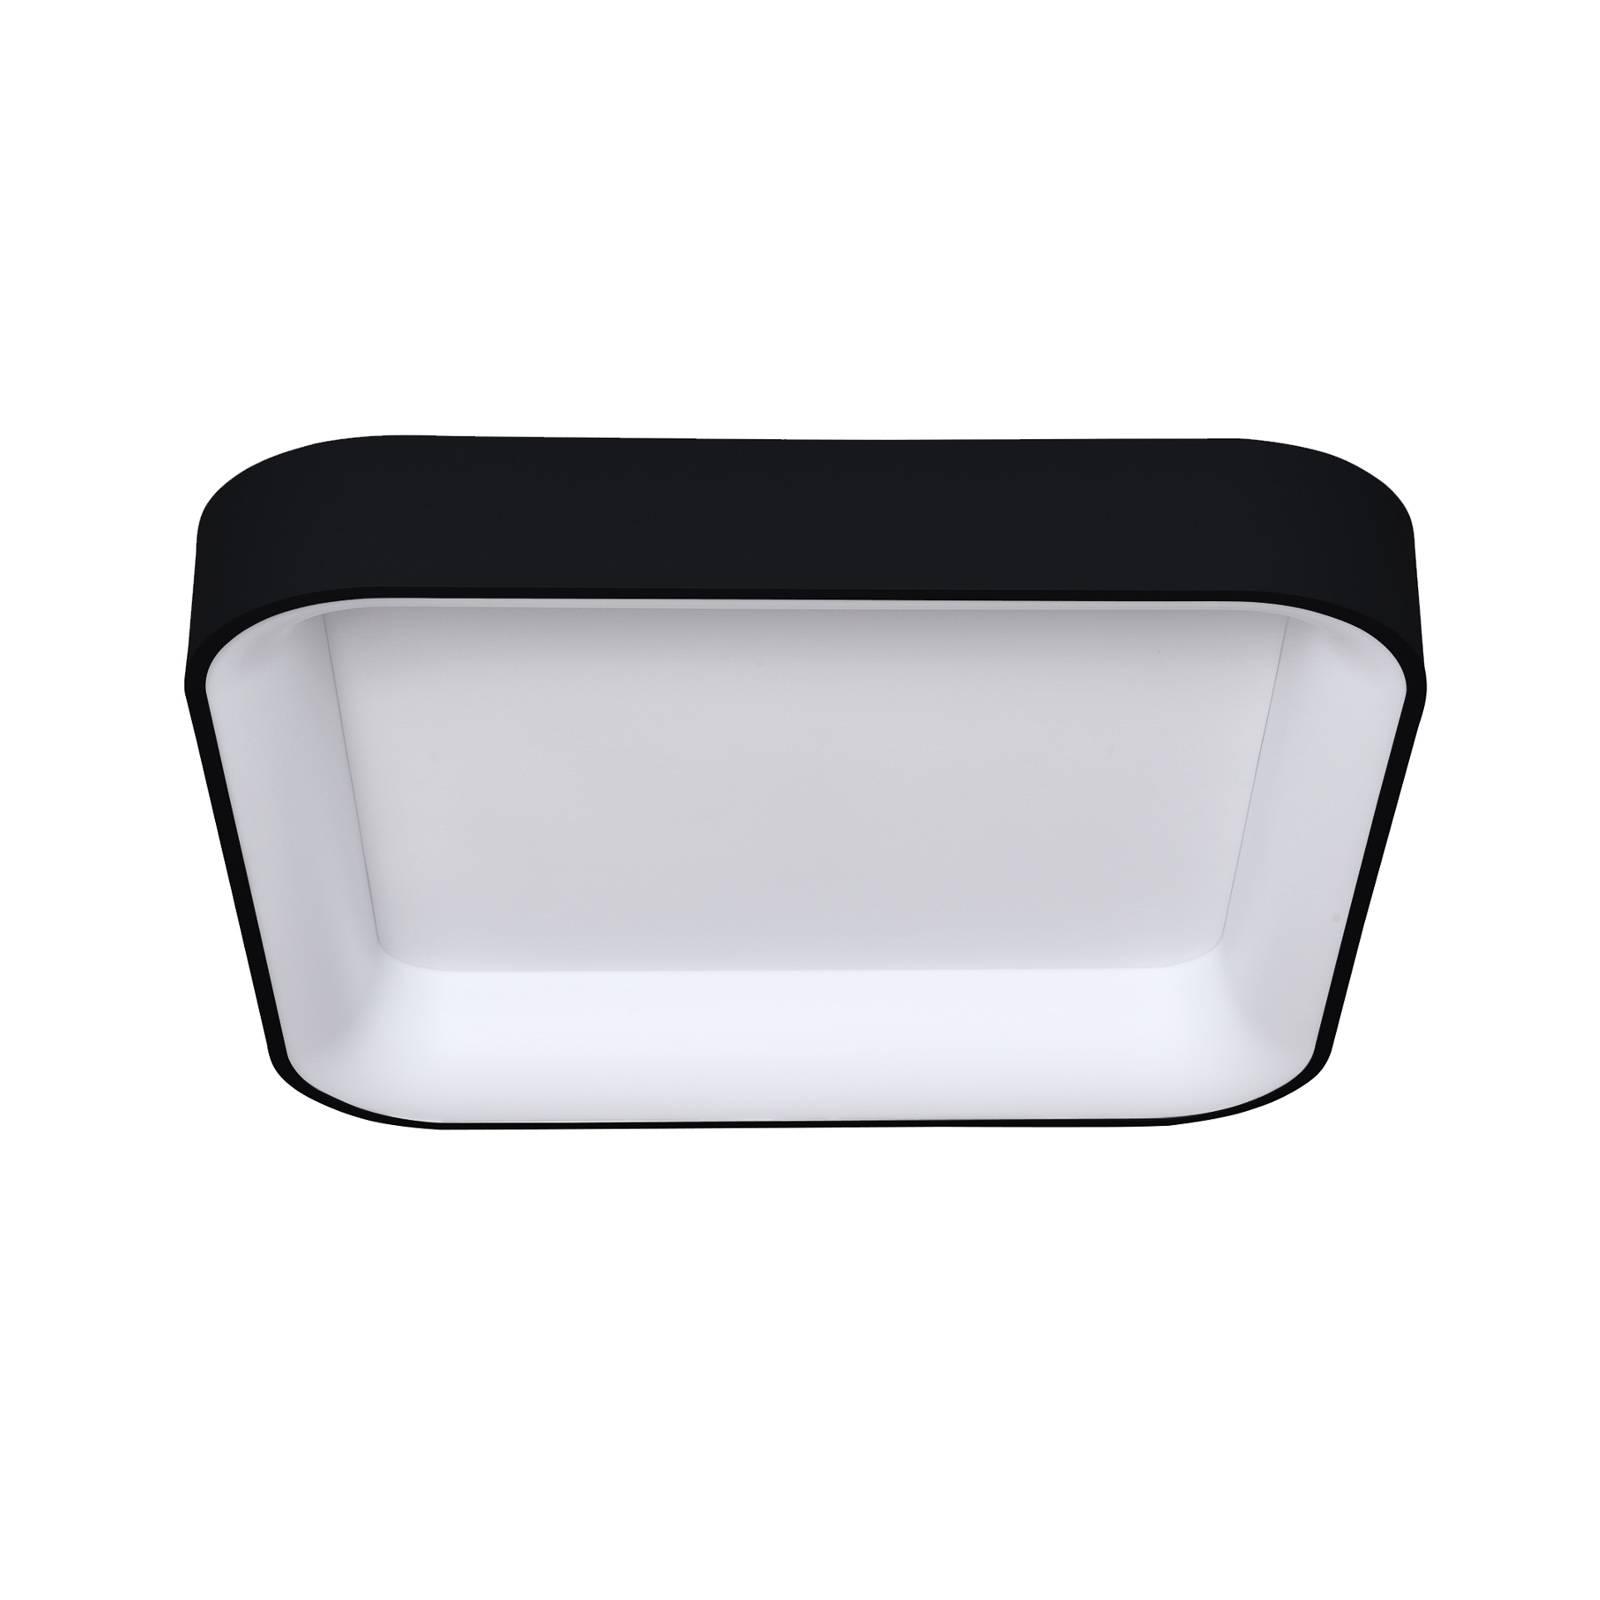 Arcchio Aleksi -LED-kattovalaisin, 60 cm kulmikas